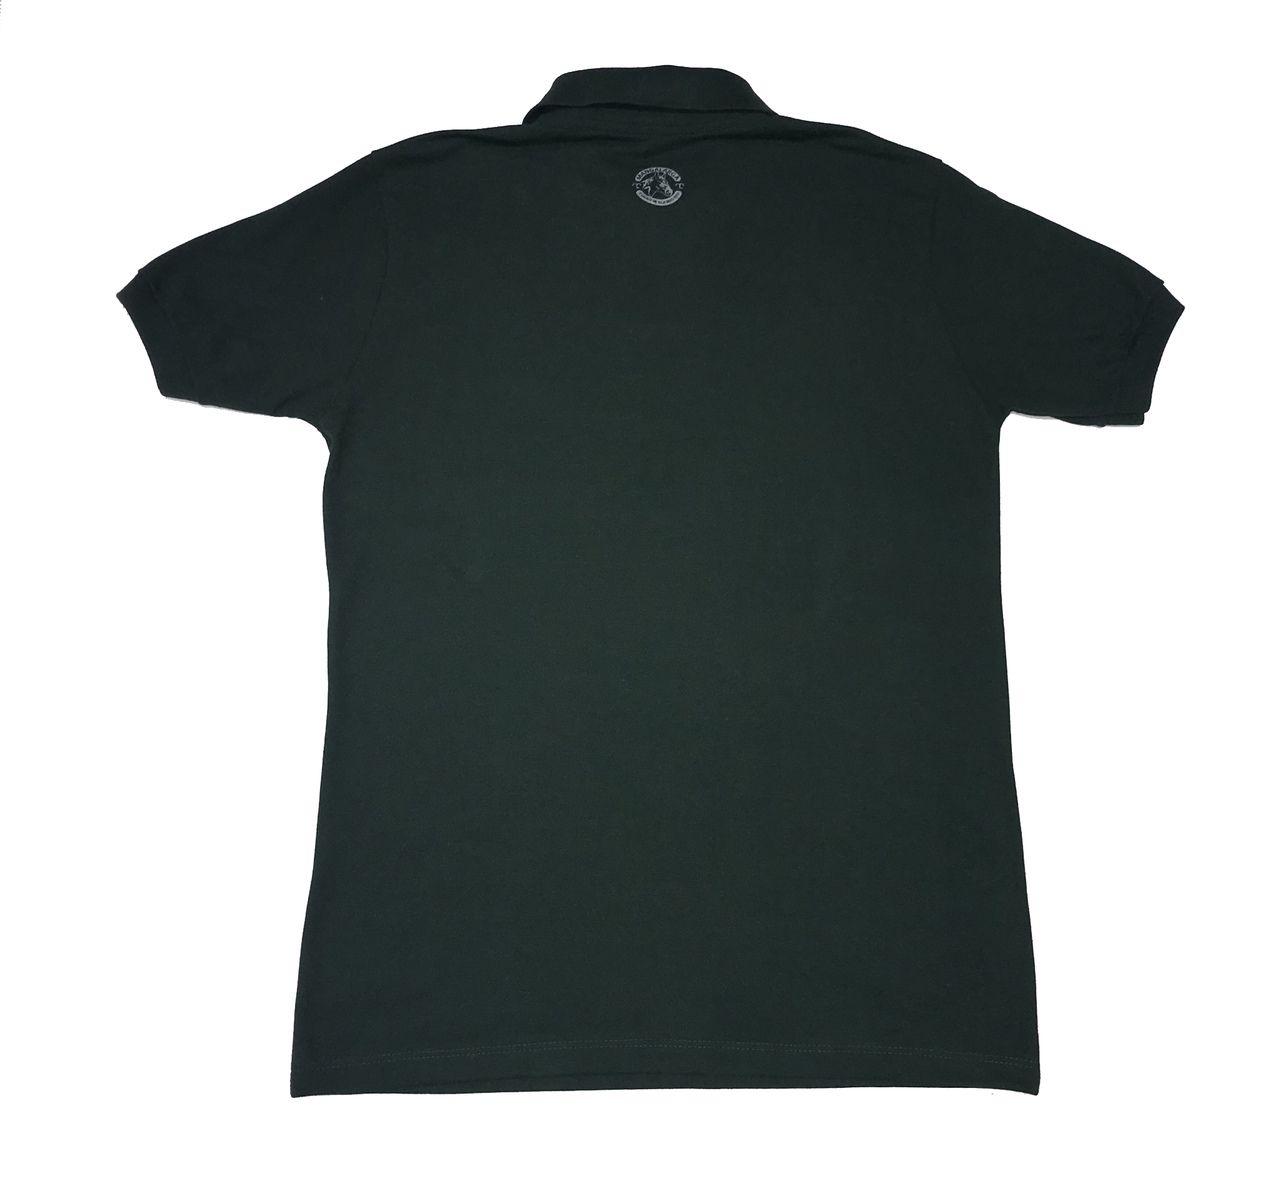 Camisa Polo Masculina Cores  - Boutique Mangalarga